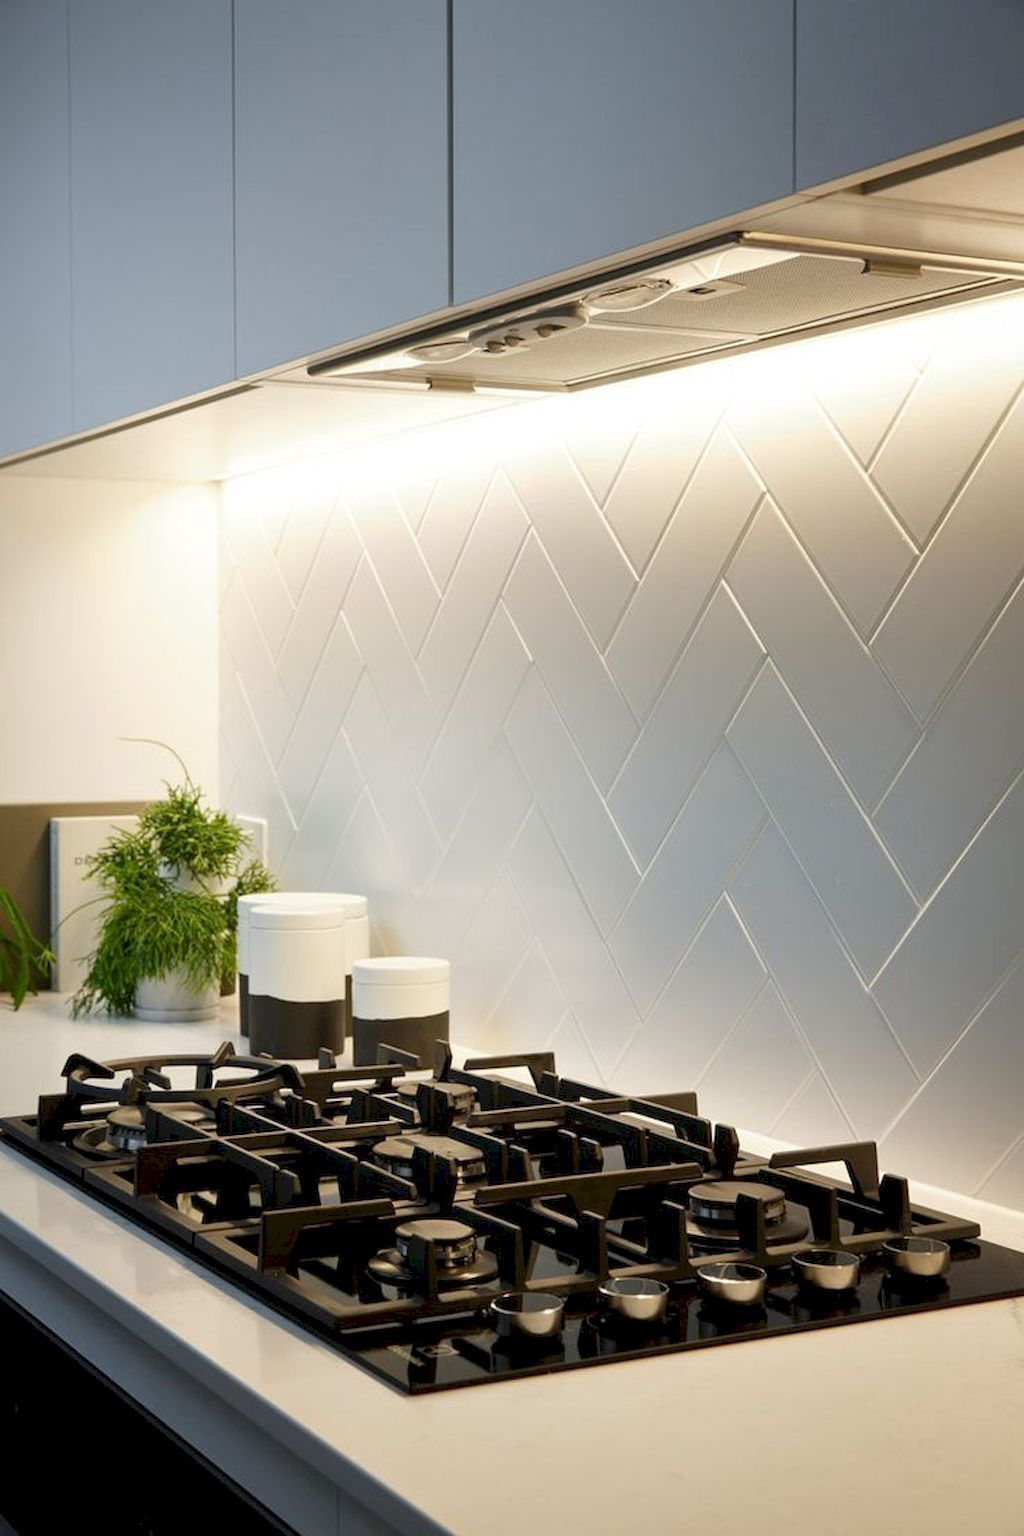 Pin by colorful backsplash on kitchen backsplash black countertop in